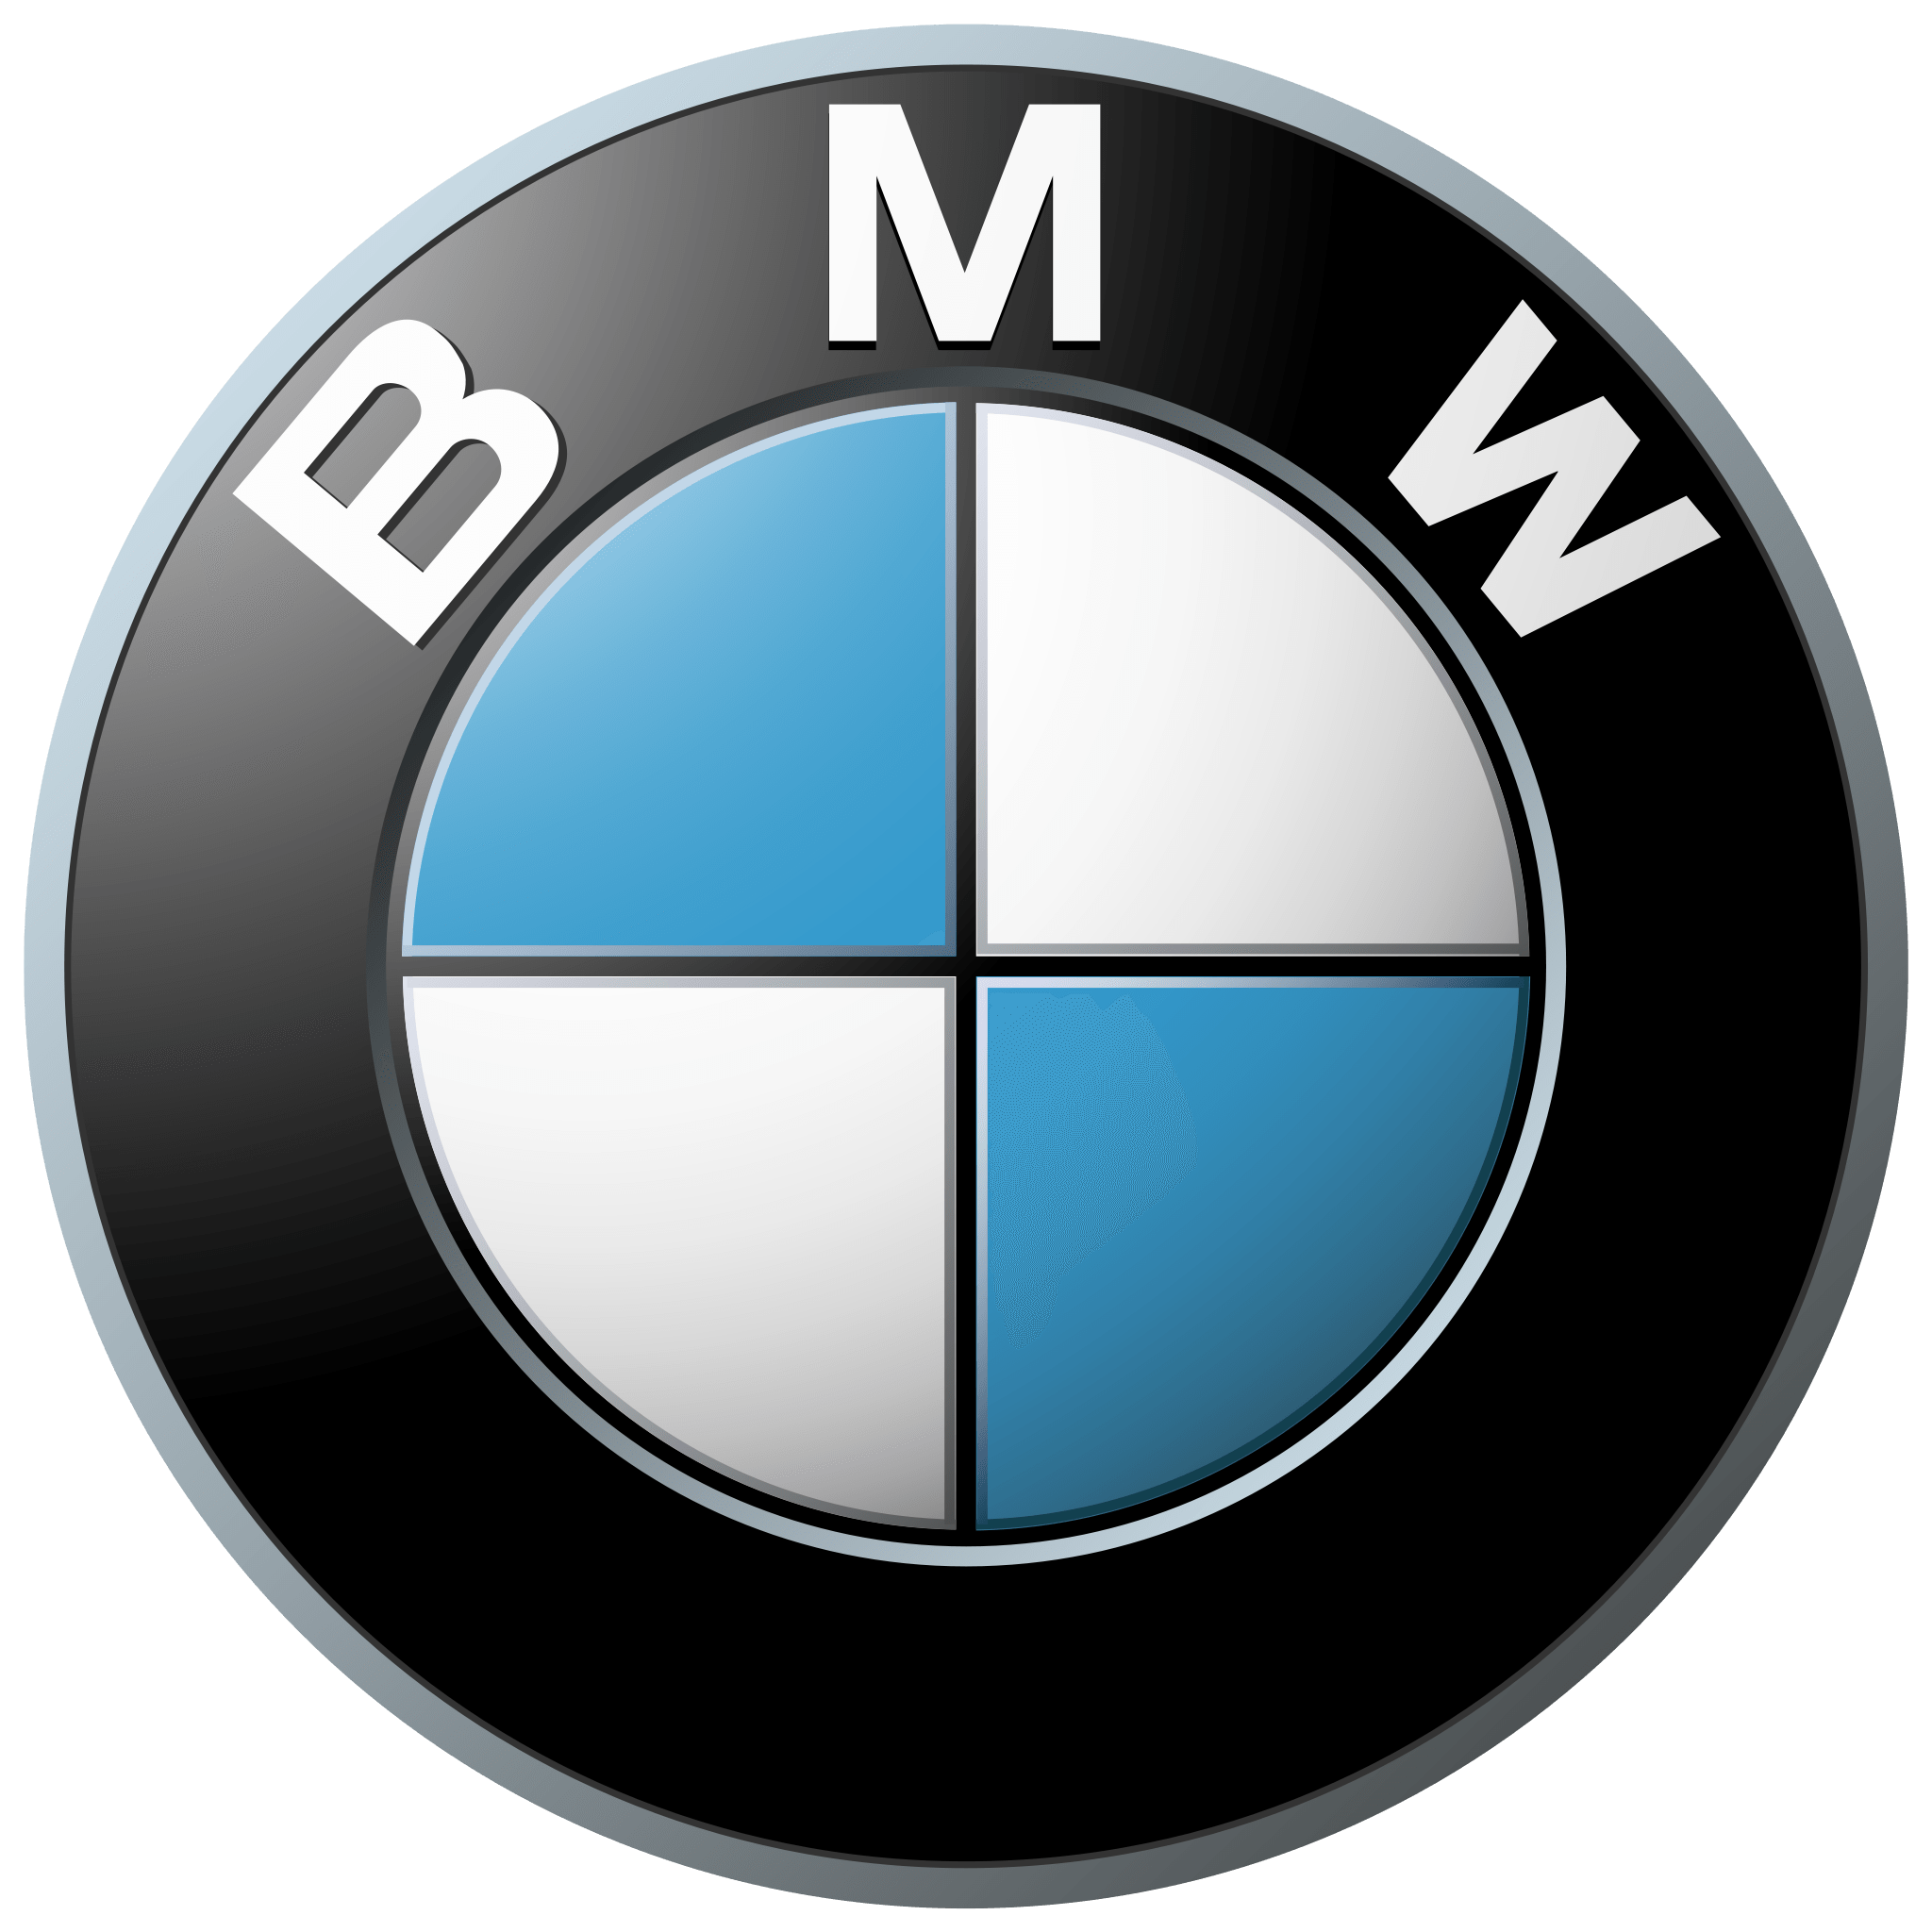 Car Logo Bmw - Car, Transparent background PNG HD thumbnail